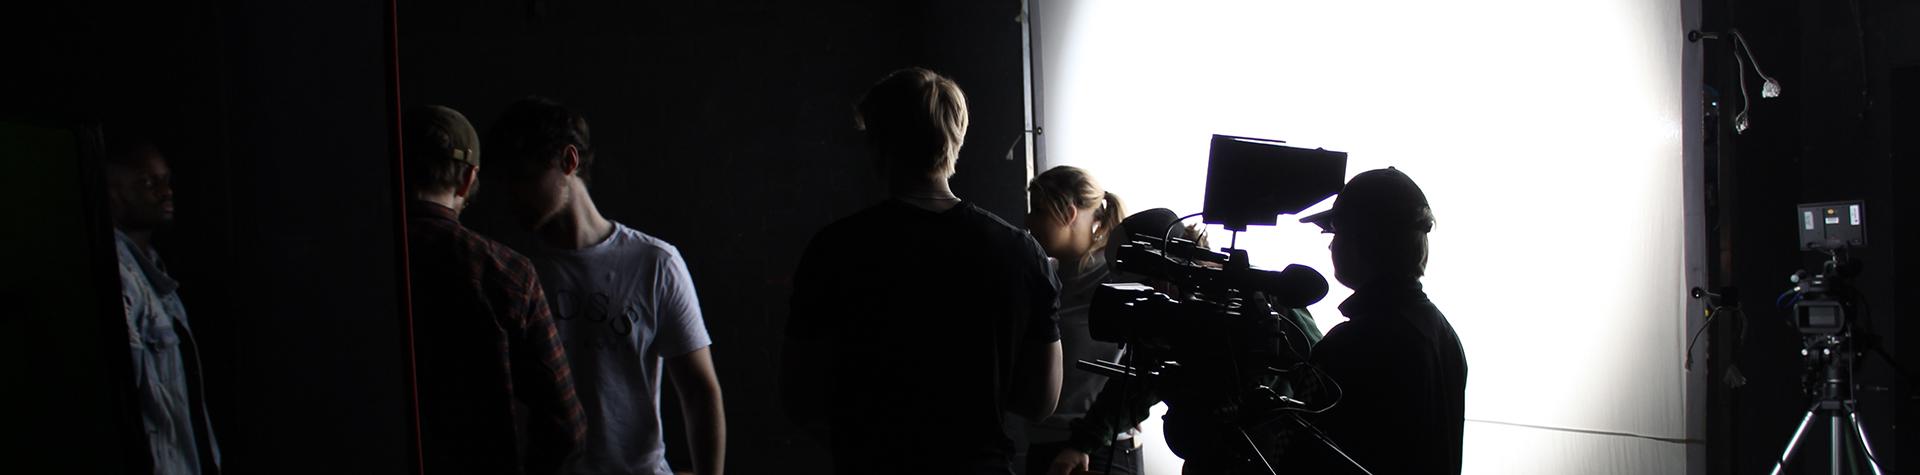 BA Digital Film Production Light Class